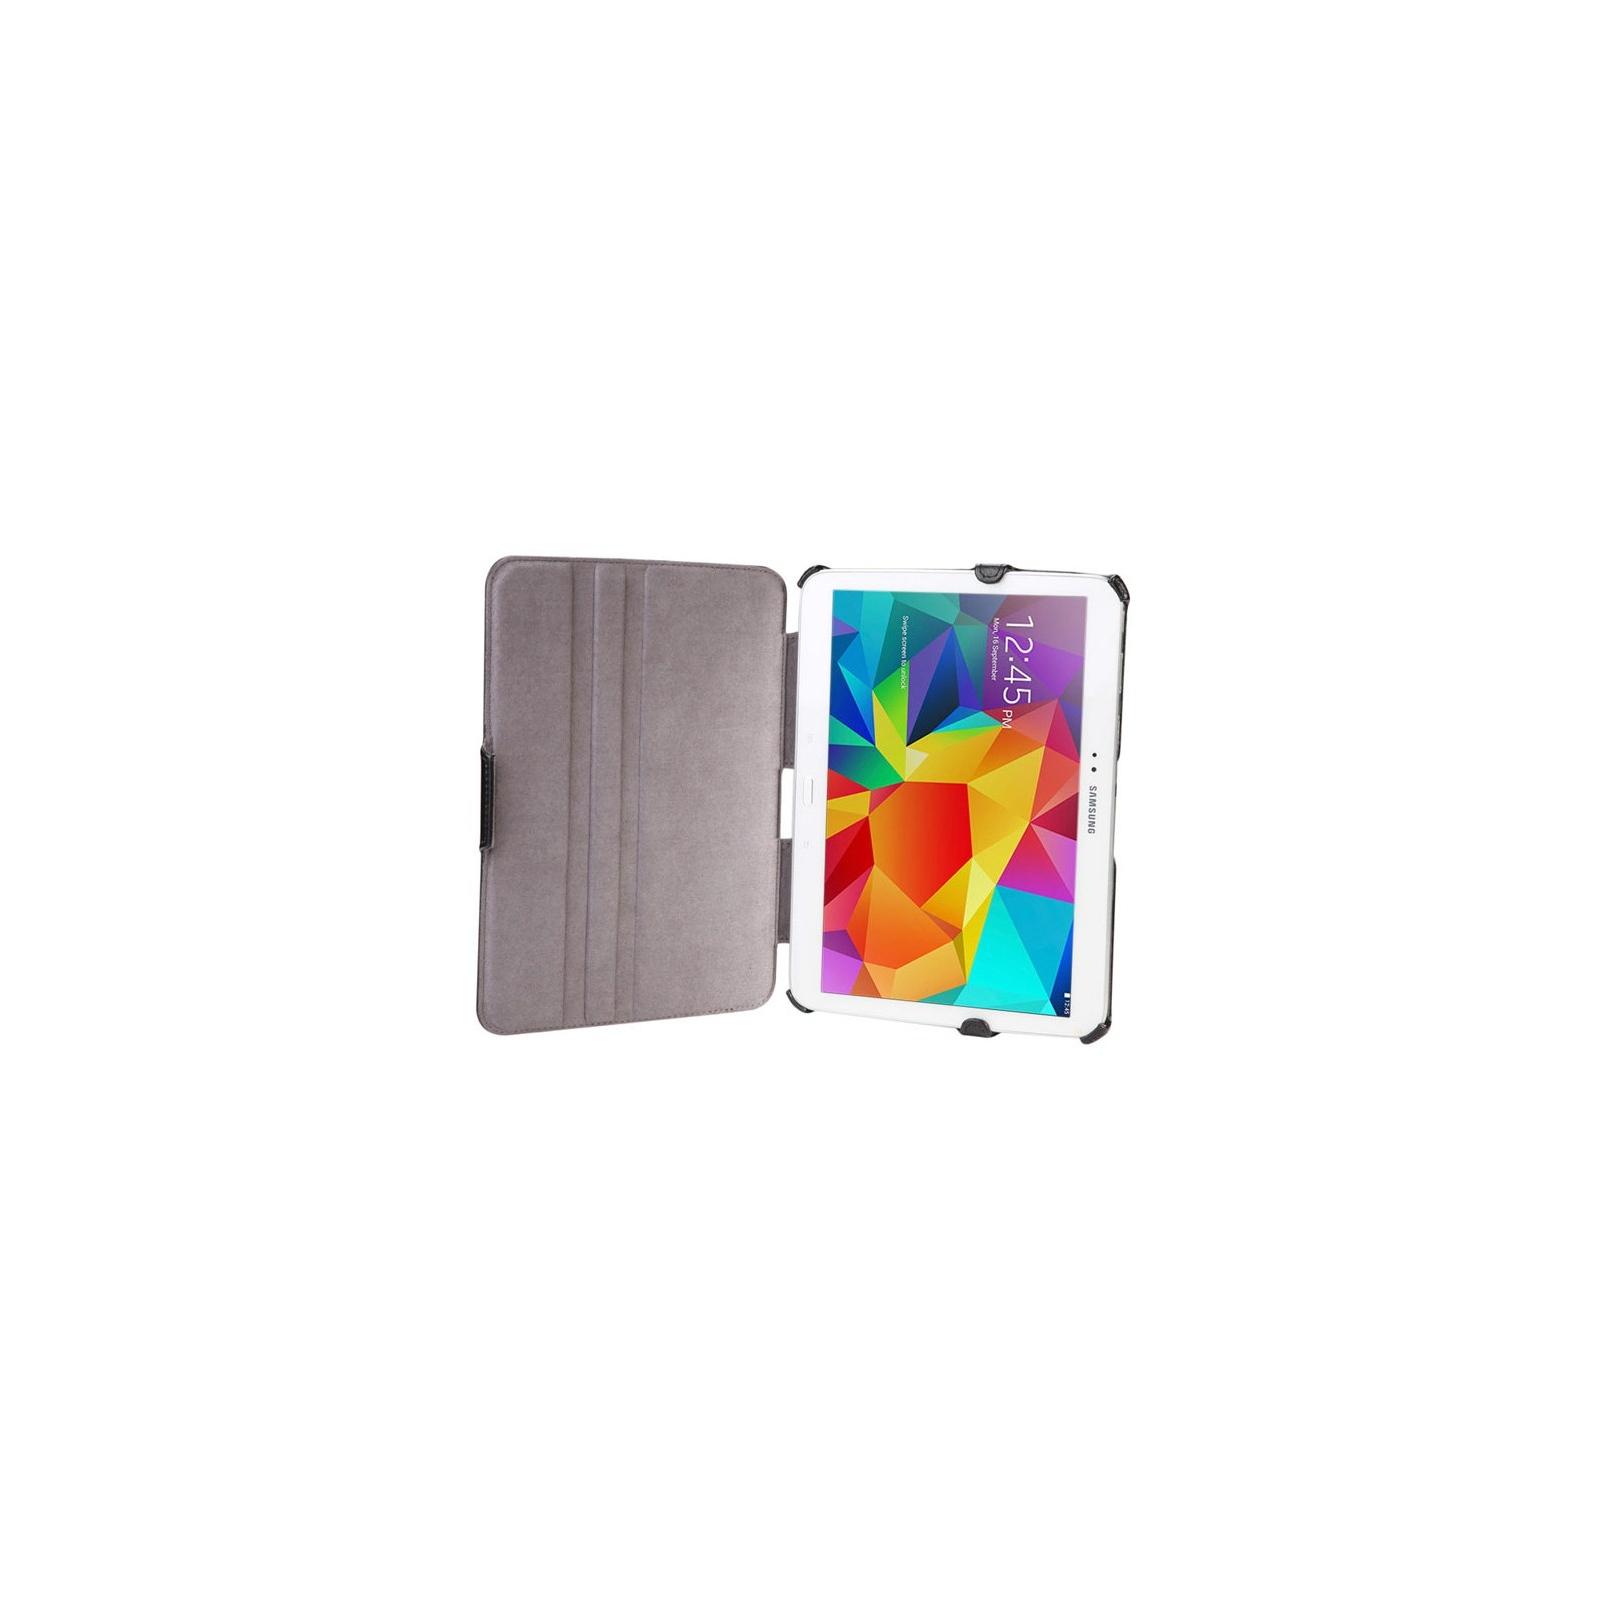 Чехол для планшета AirOn для Samsung GALAXY Tab 4 10.1 black (6946795850175) изображение 2